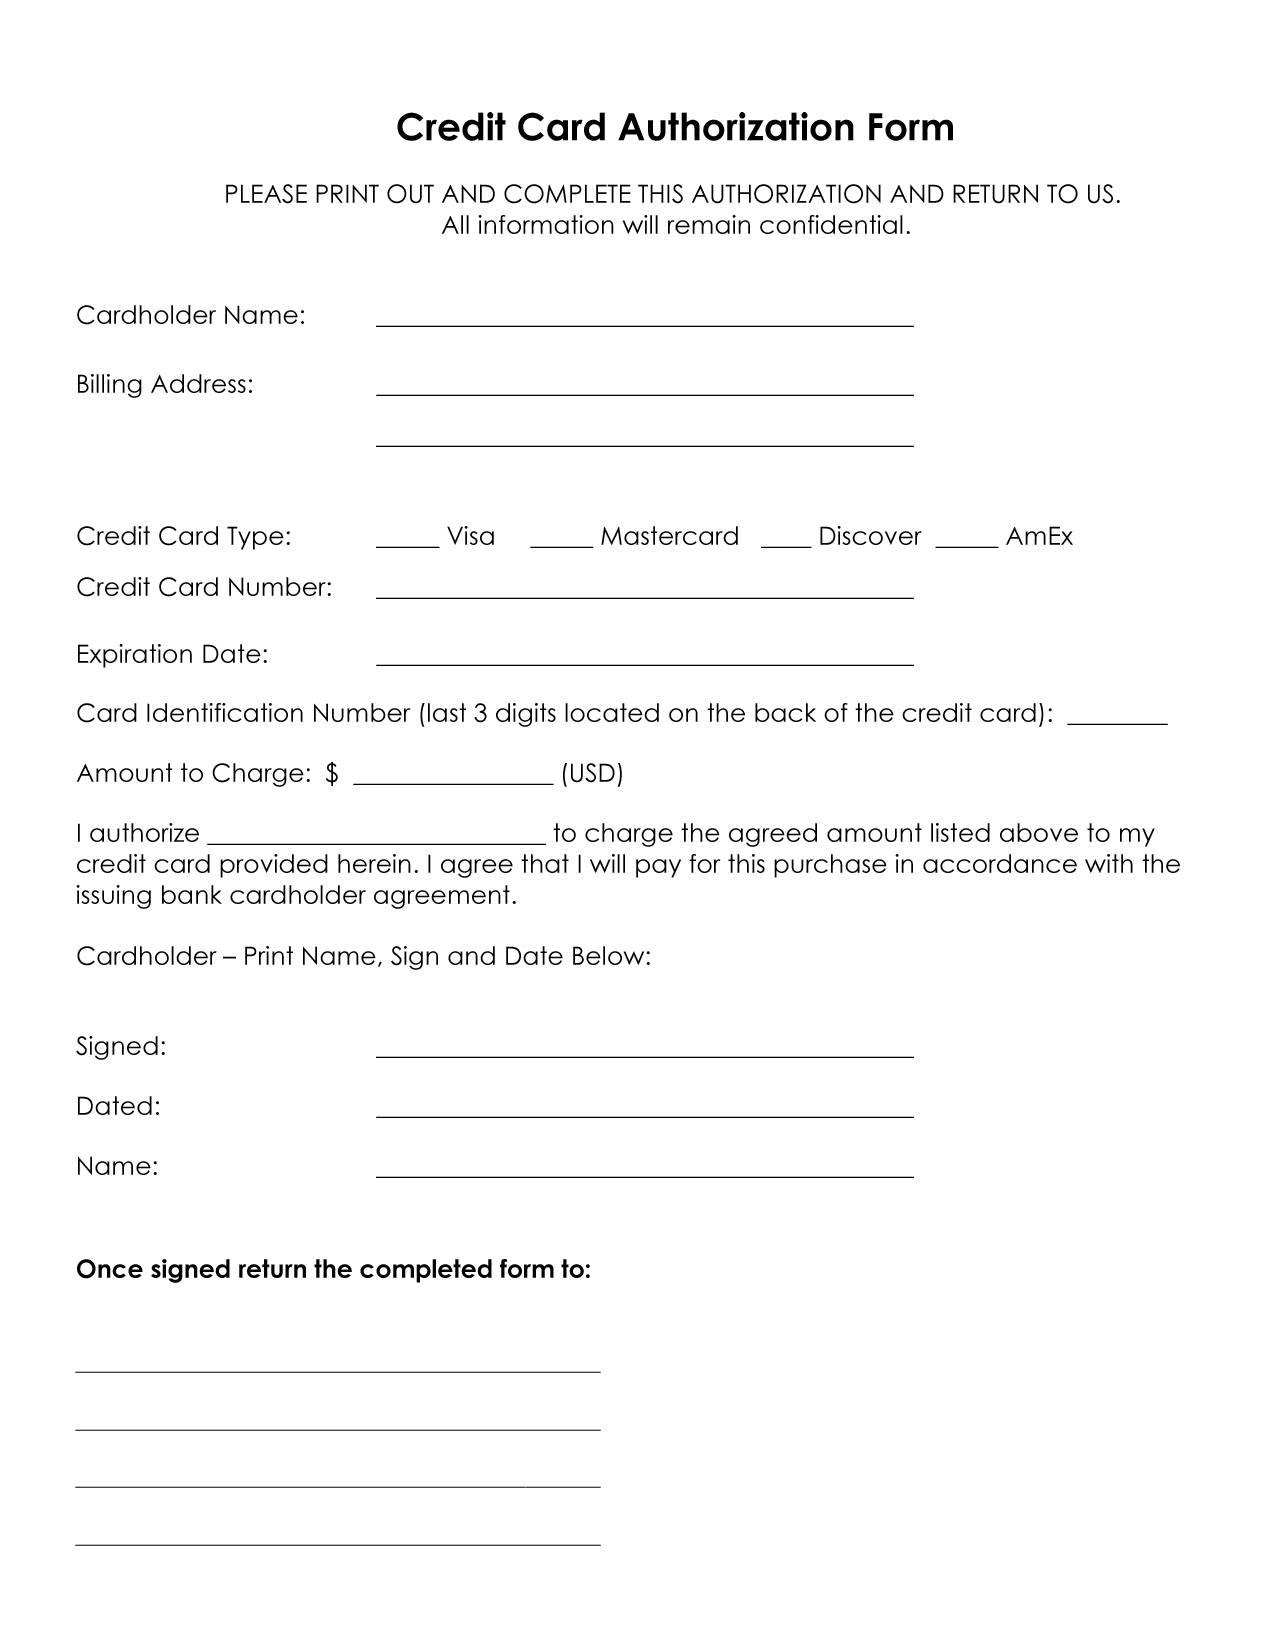 credit card authorization form visa bio data maker credit card authorization form visa credit card authorization form cin online blank credit card template credit